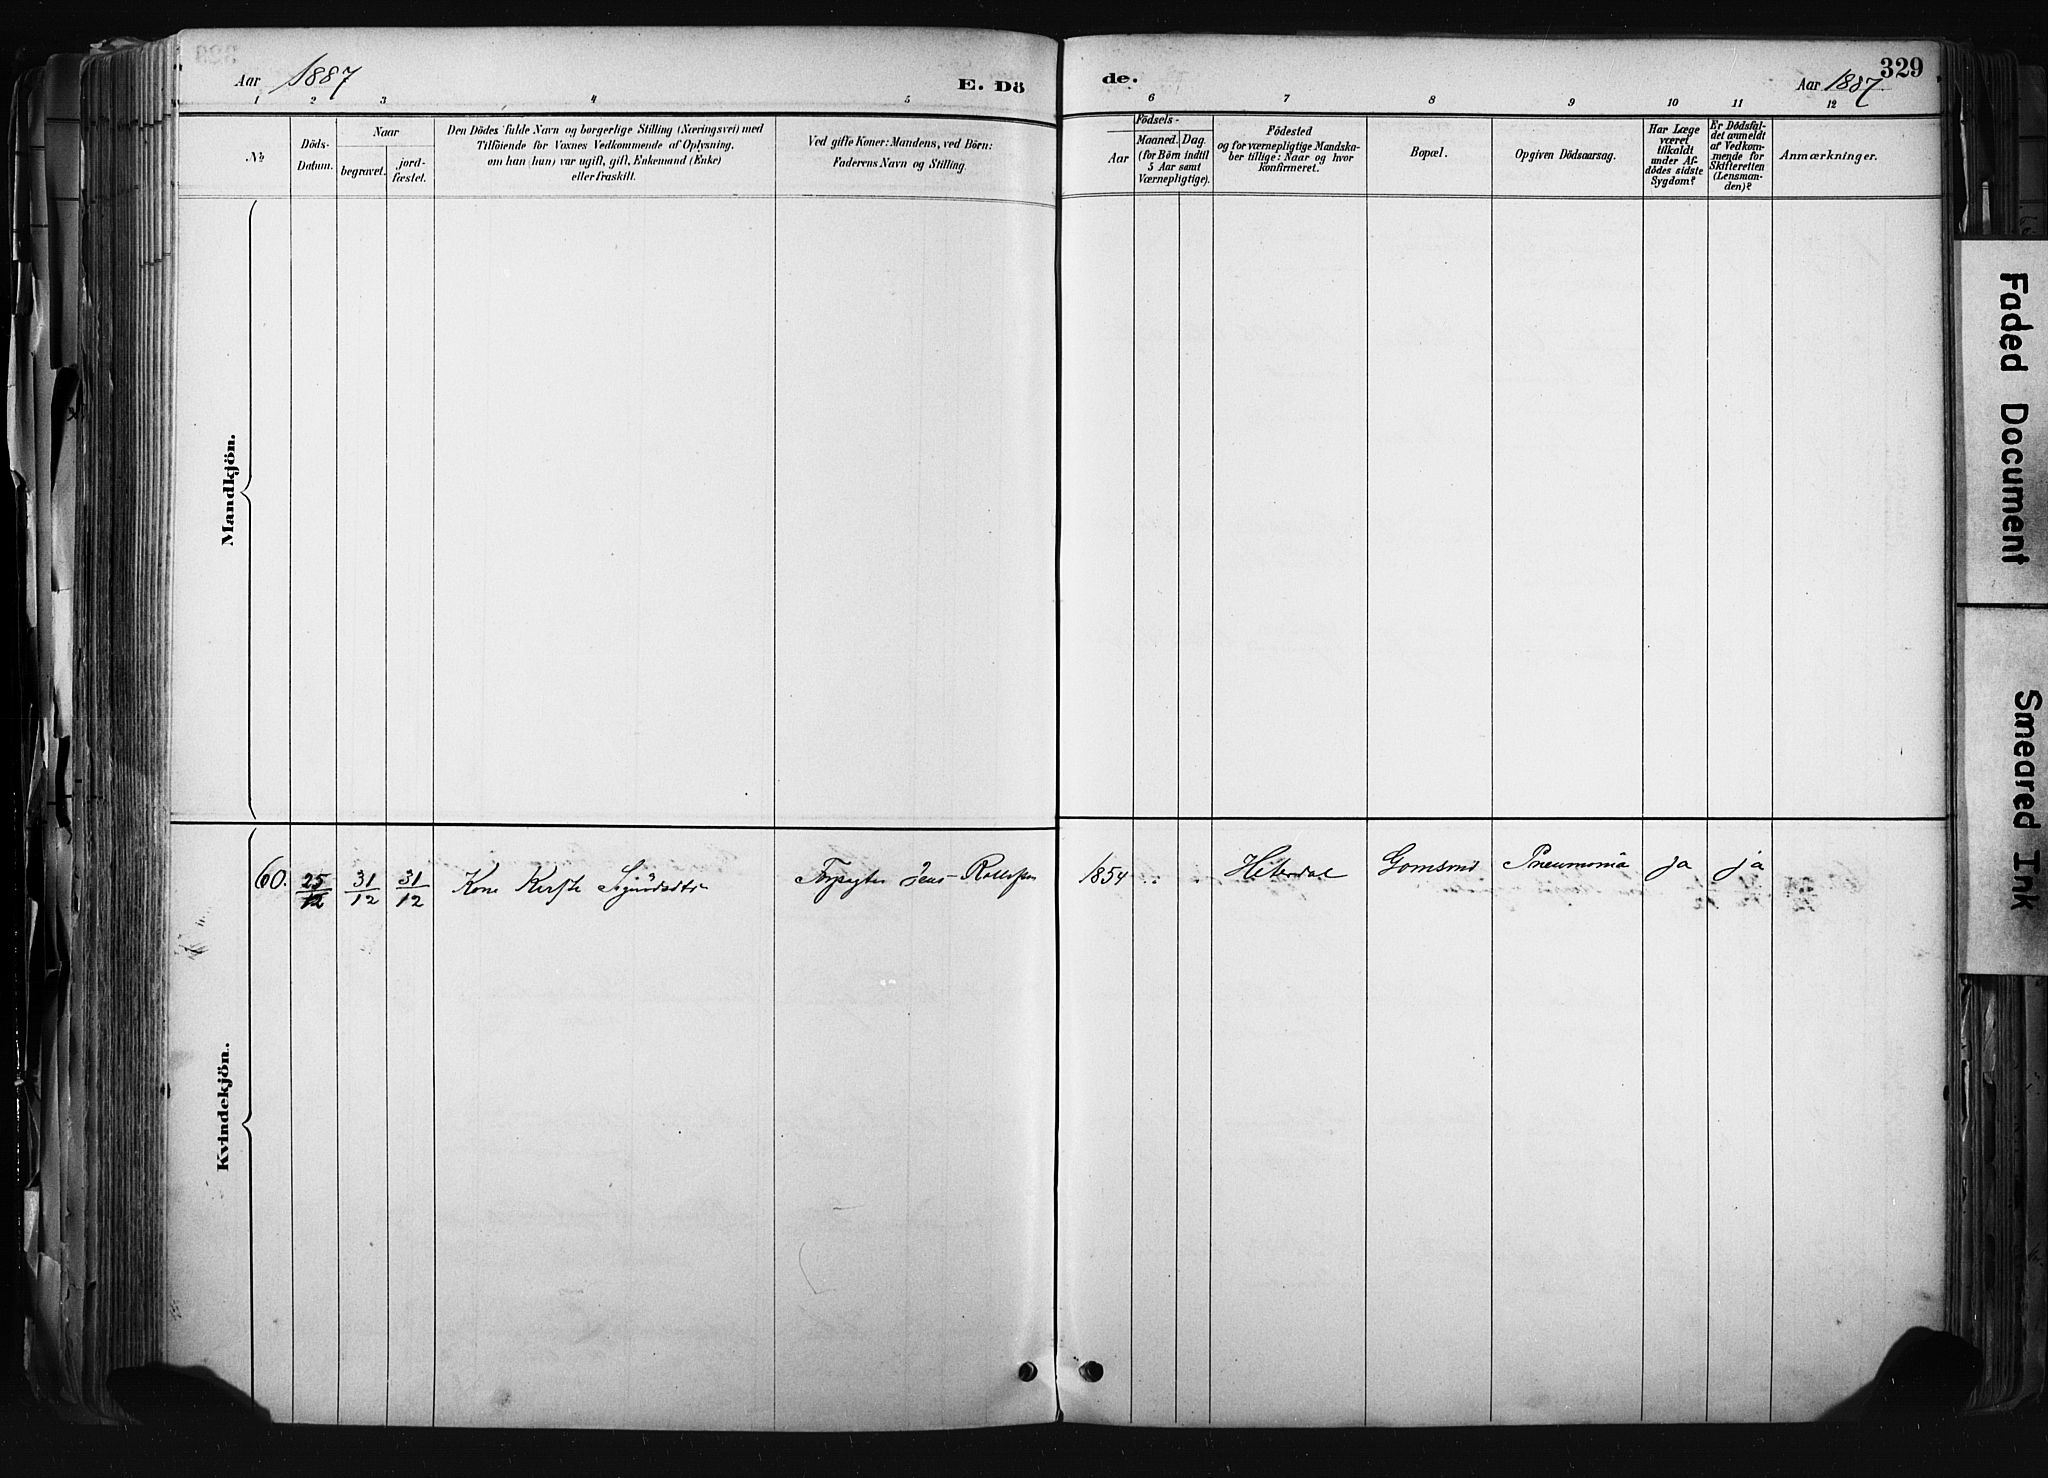 SAKO, Kongsberg kirkebøker, F/Fb/L0002: Ministerialbok nr. II 2, 1886-1896, s. 329